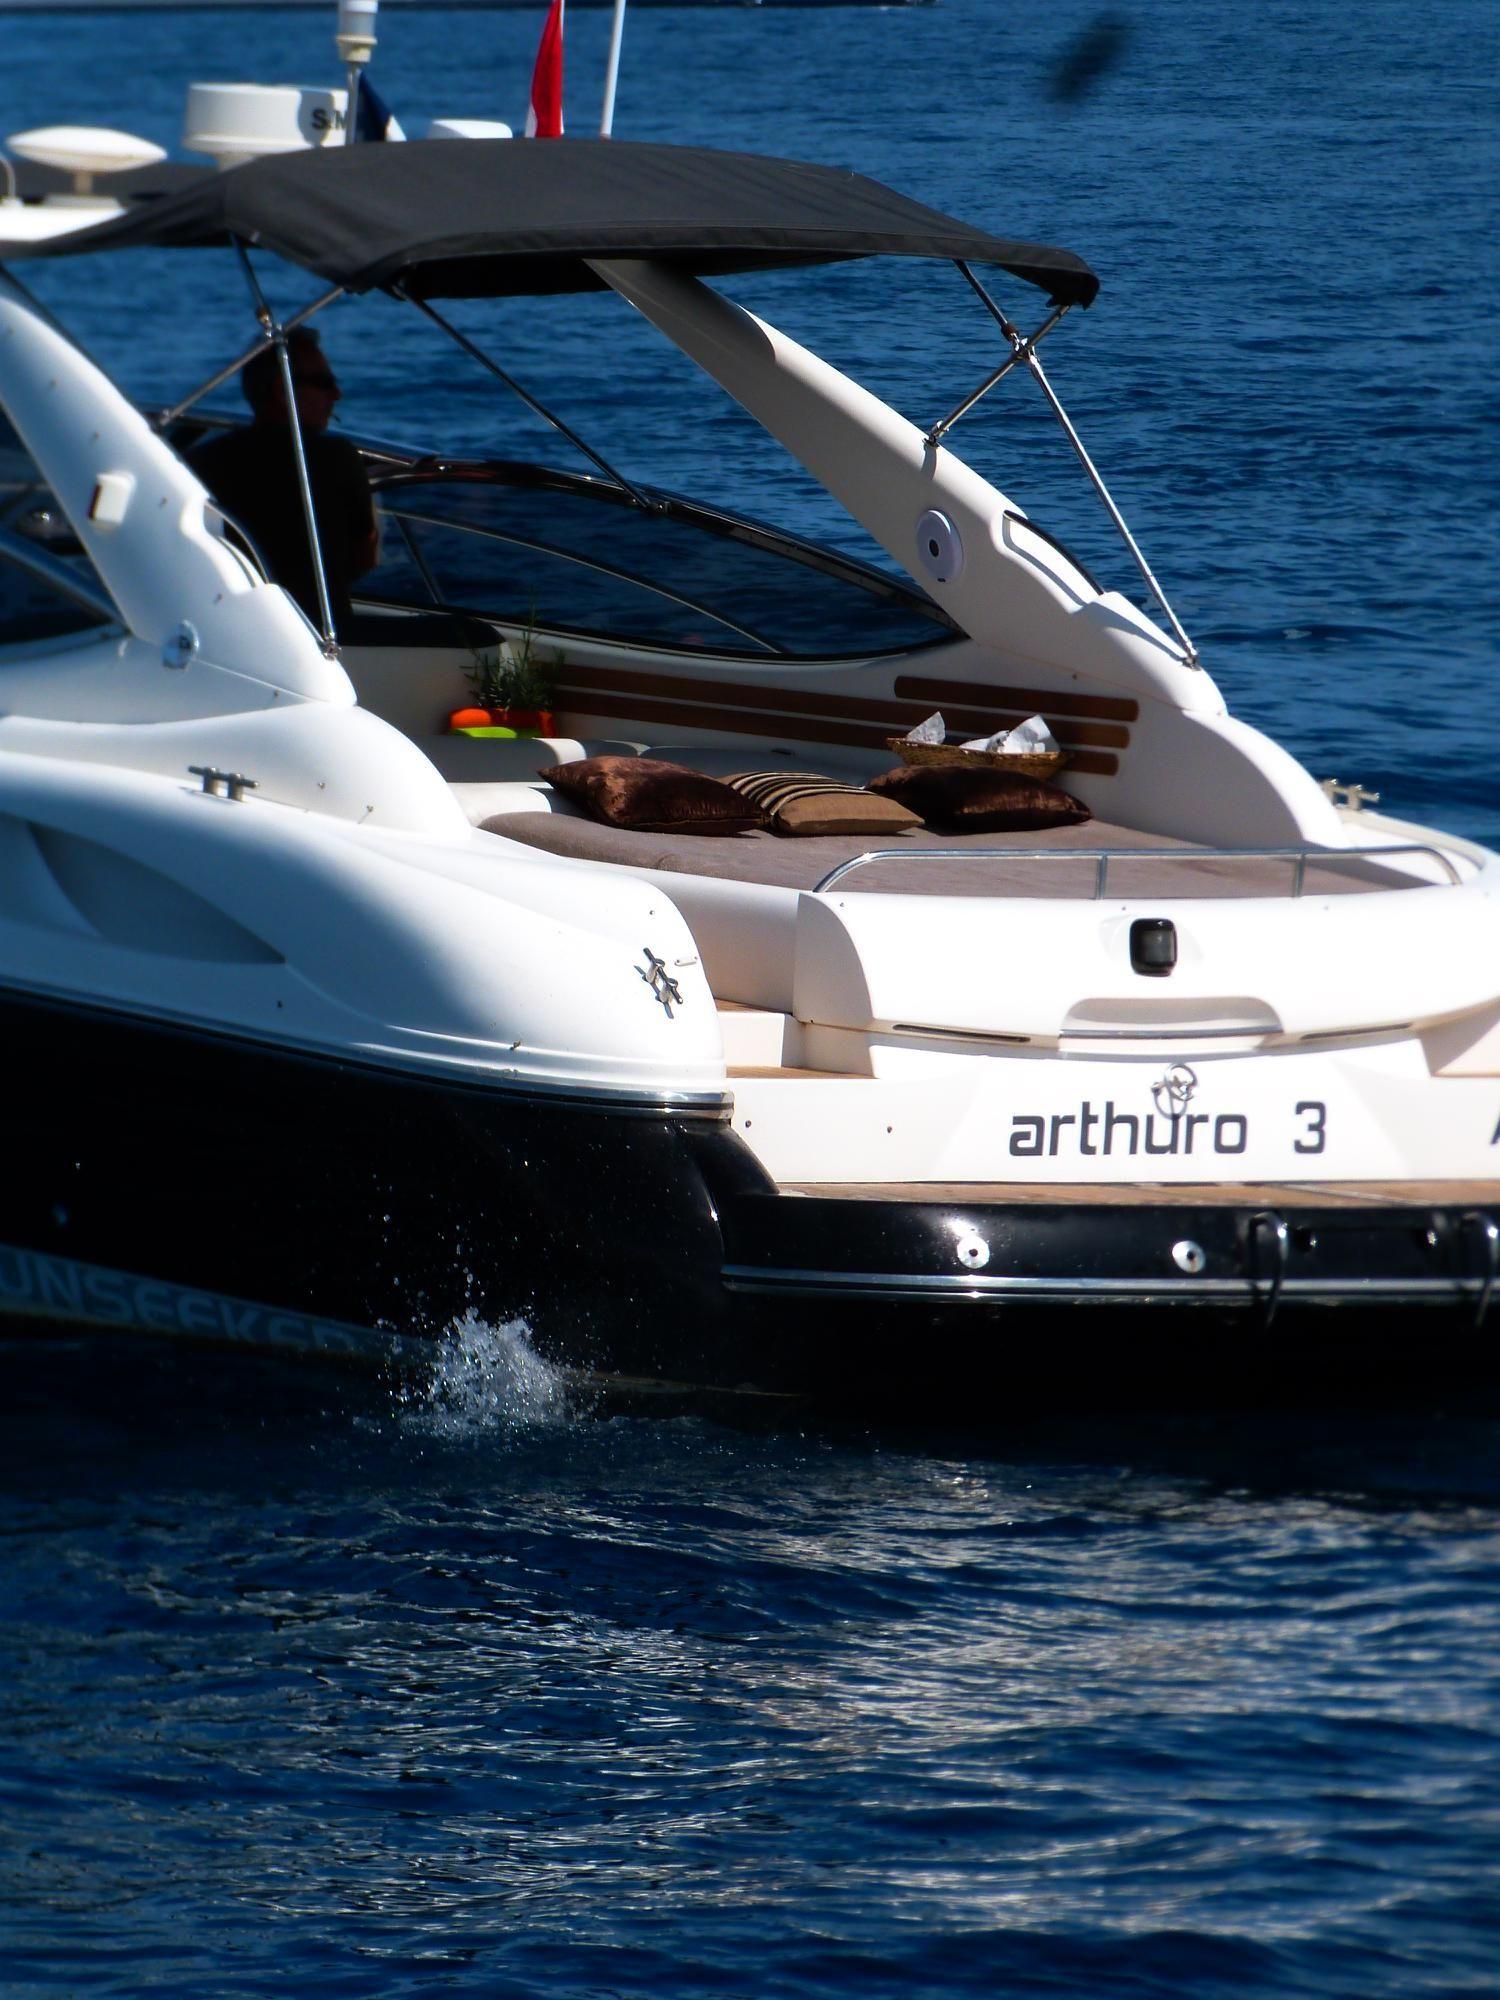 ARTHURO 3 - Sunseeker Superhawk 48